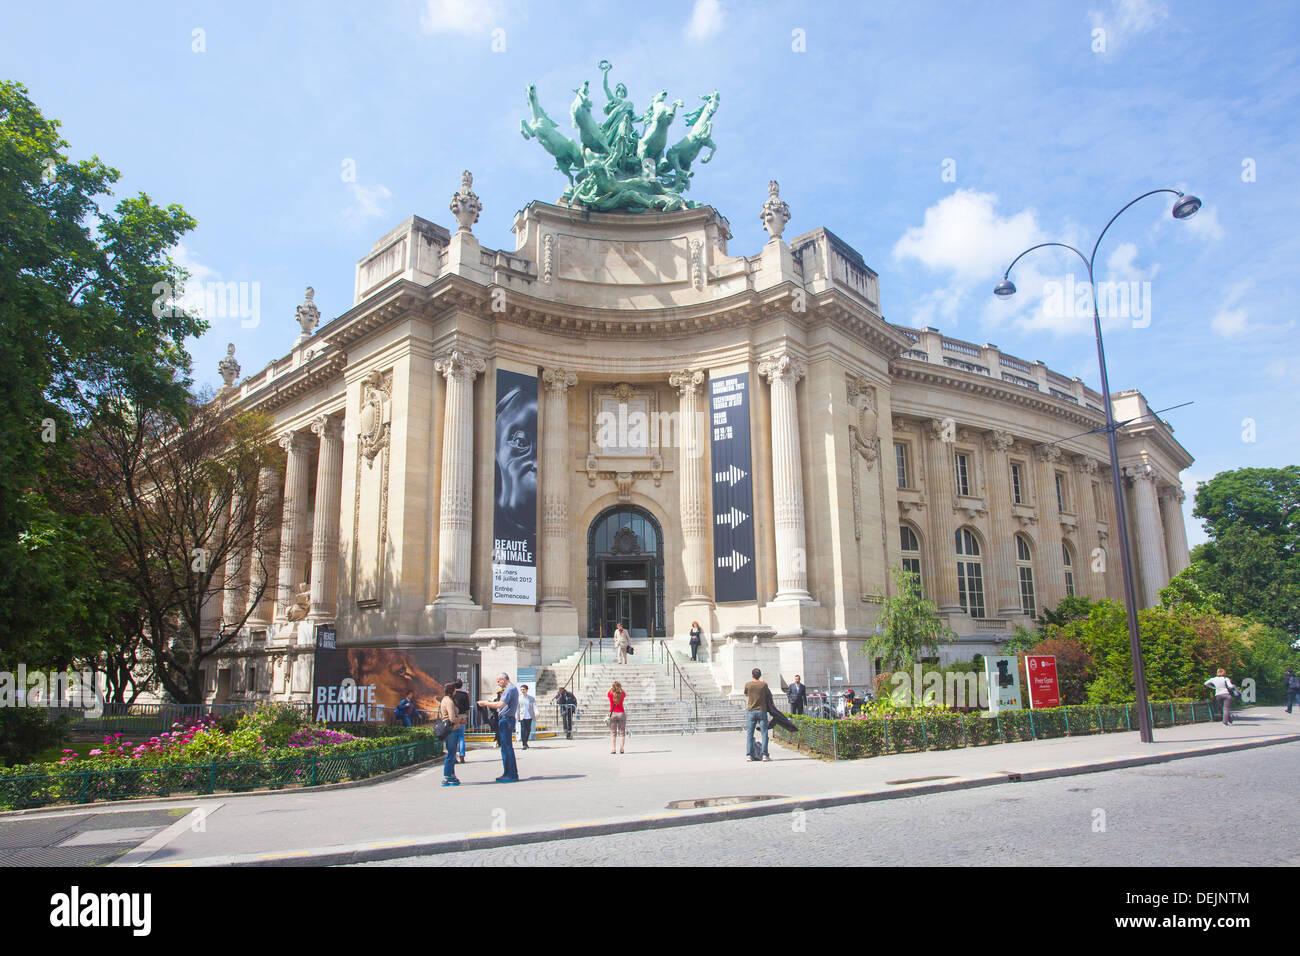 Front entrance to le grand palais des beaux arts in the grand palais stock photo royalty free - Expo le grand palais ...